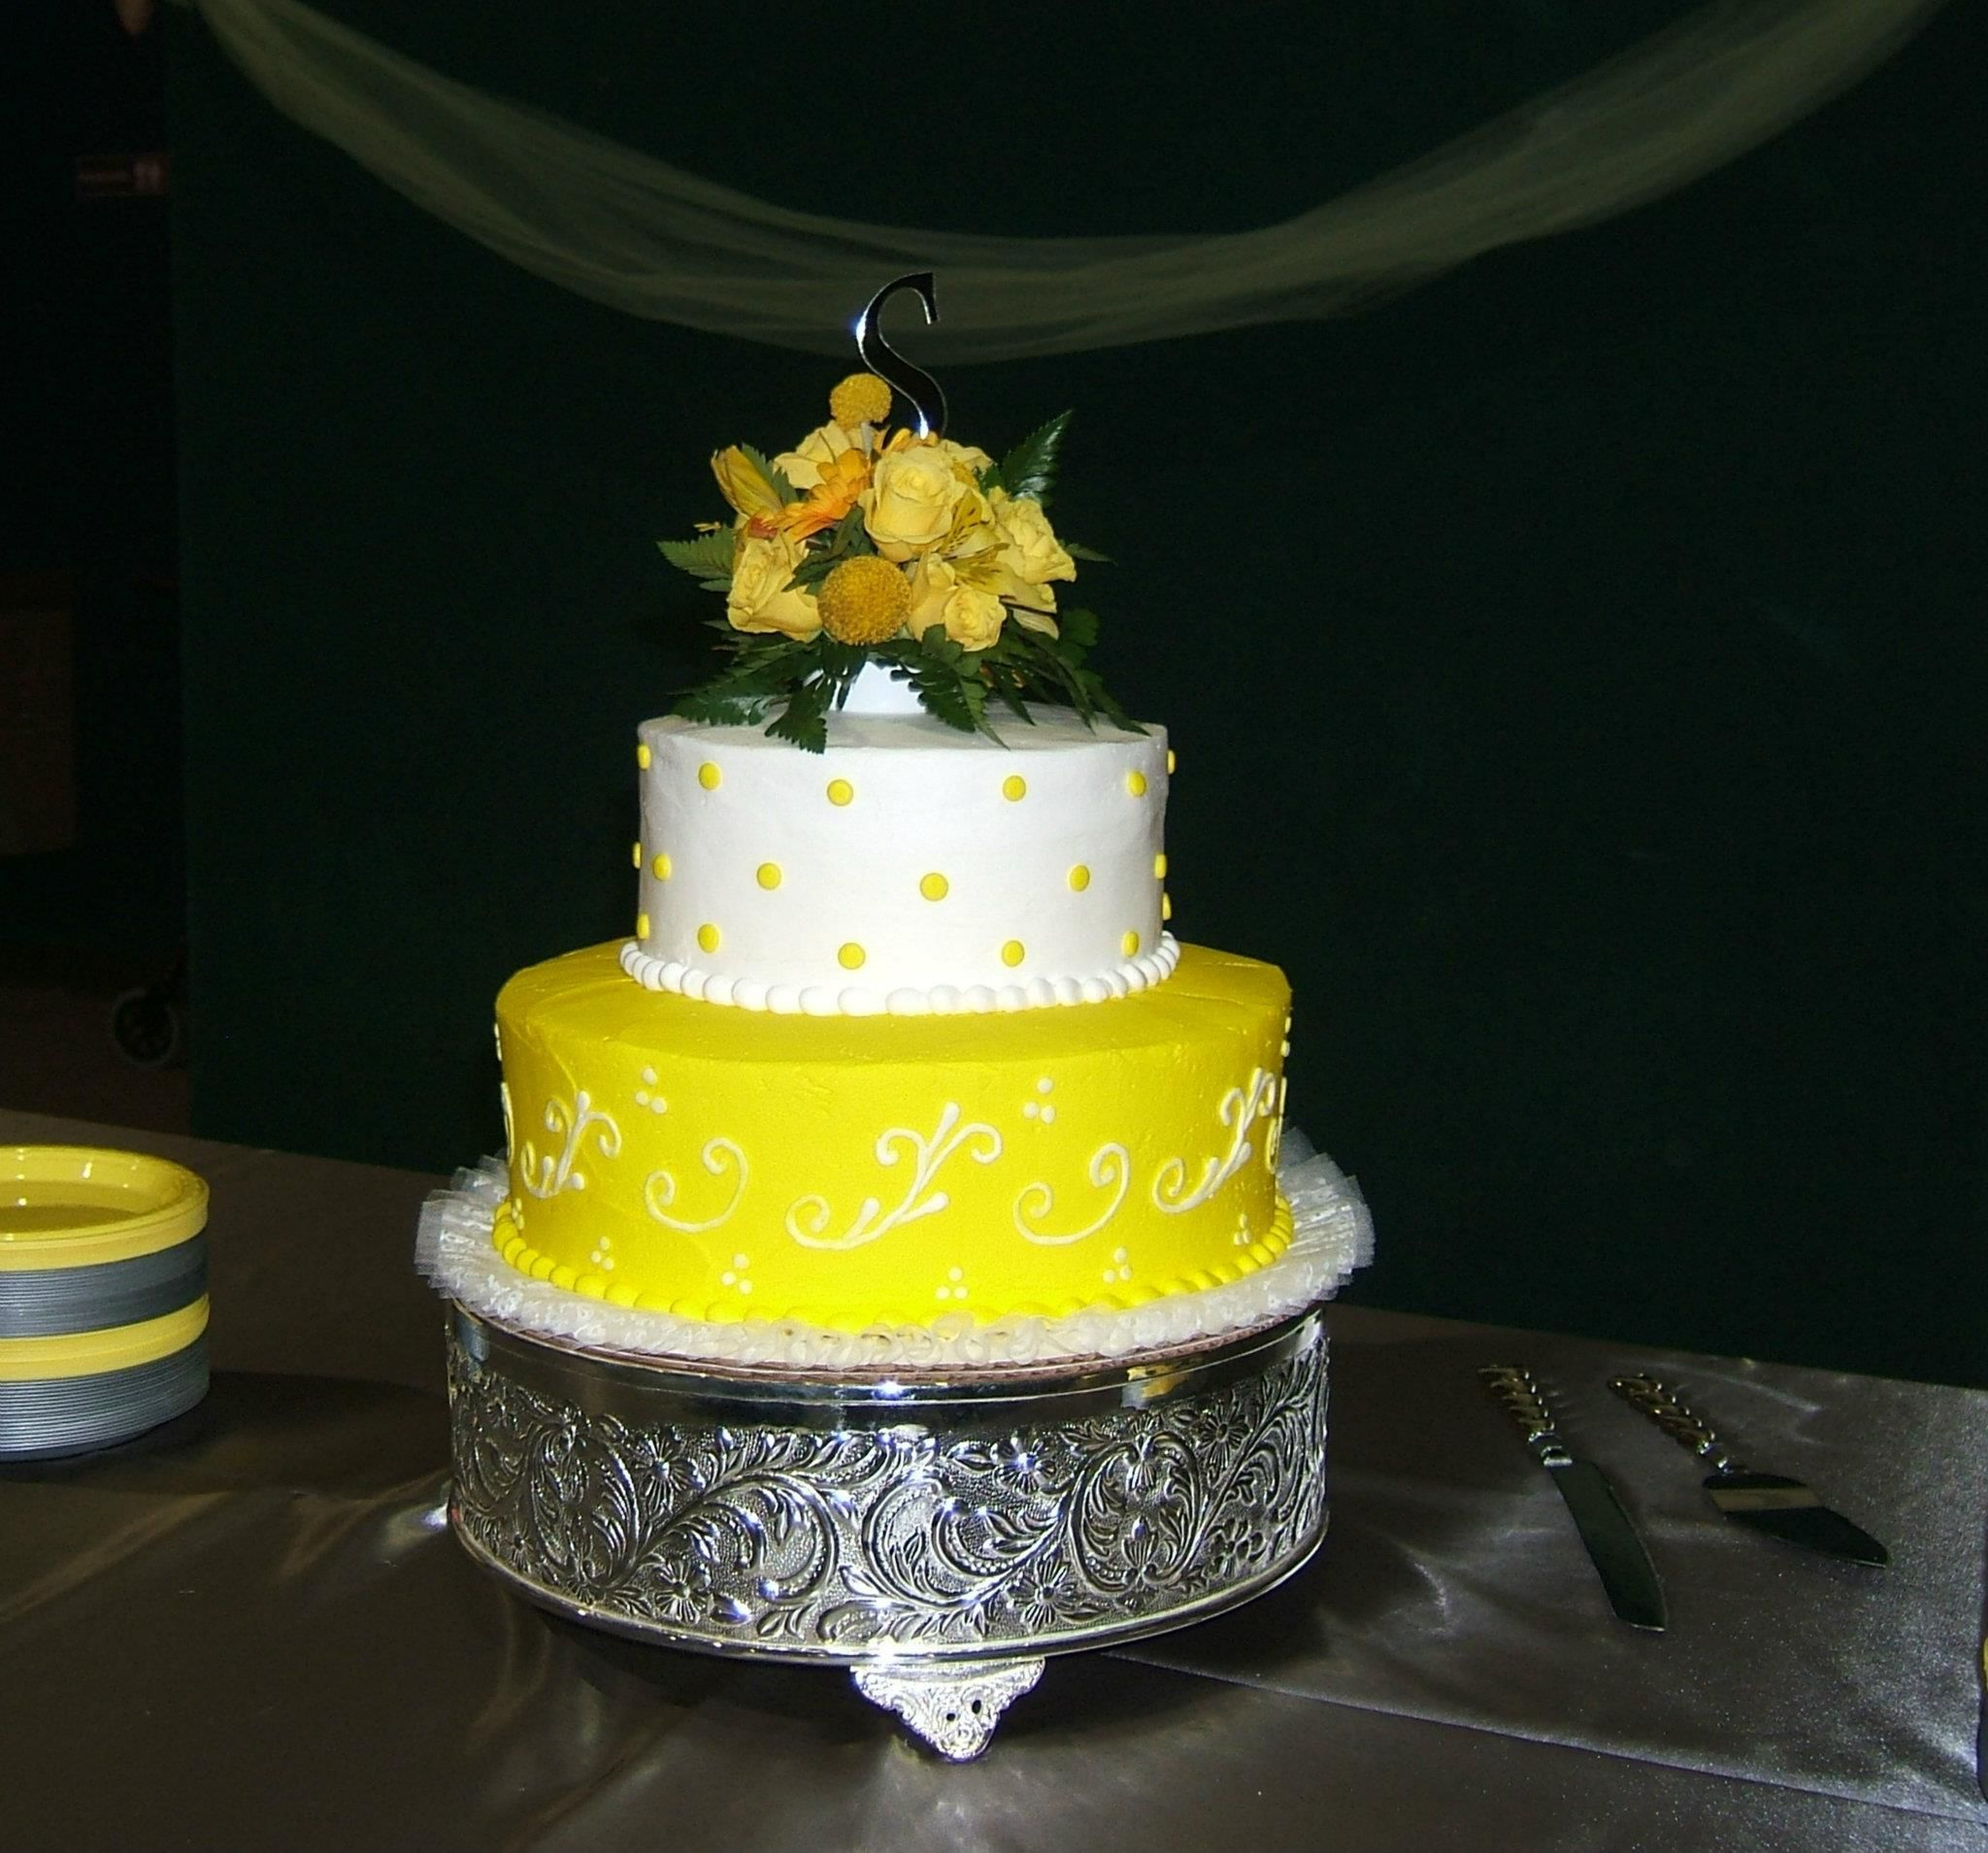 Yellow & White Wedding Cake from Fishers Bakery! May 2012